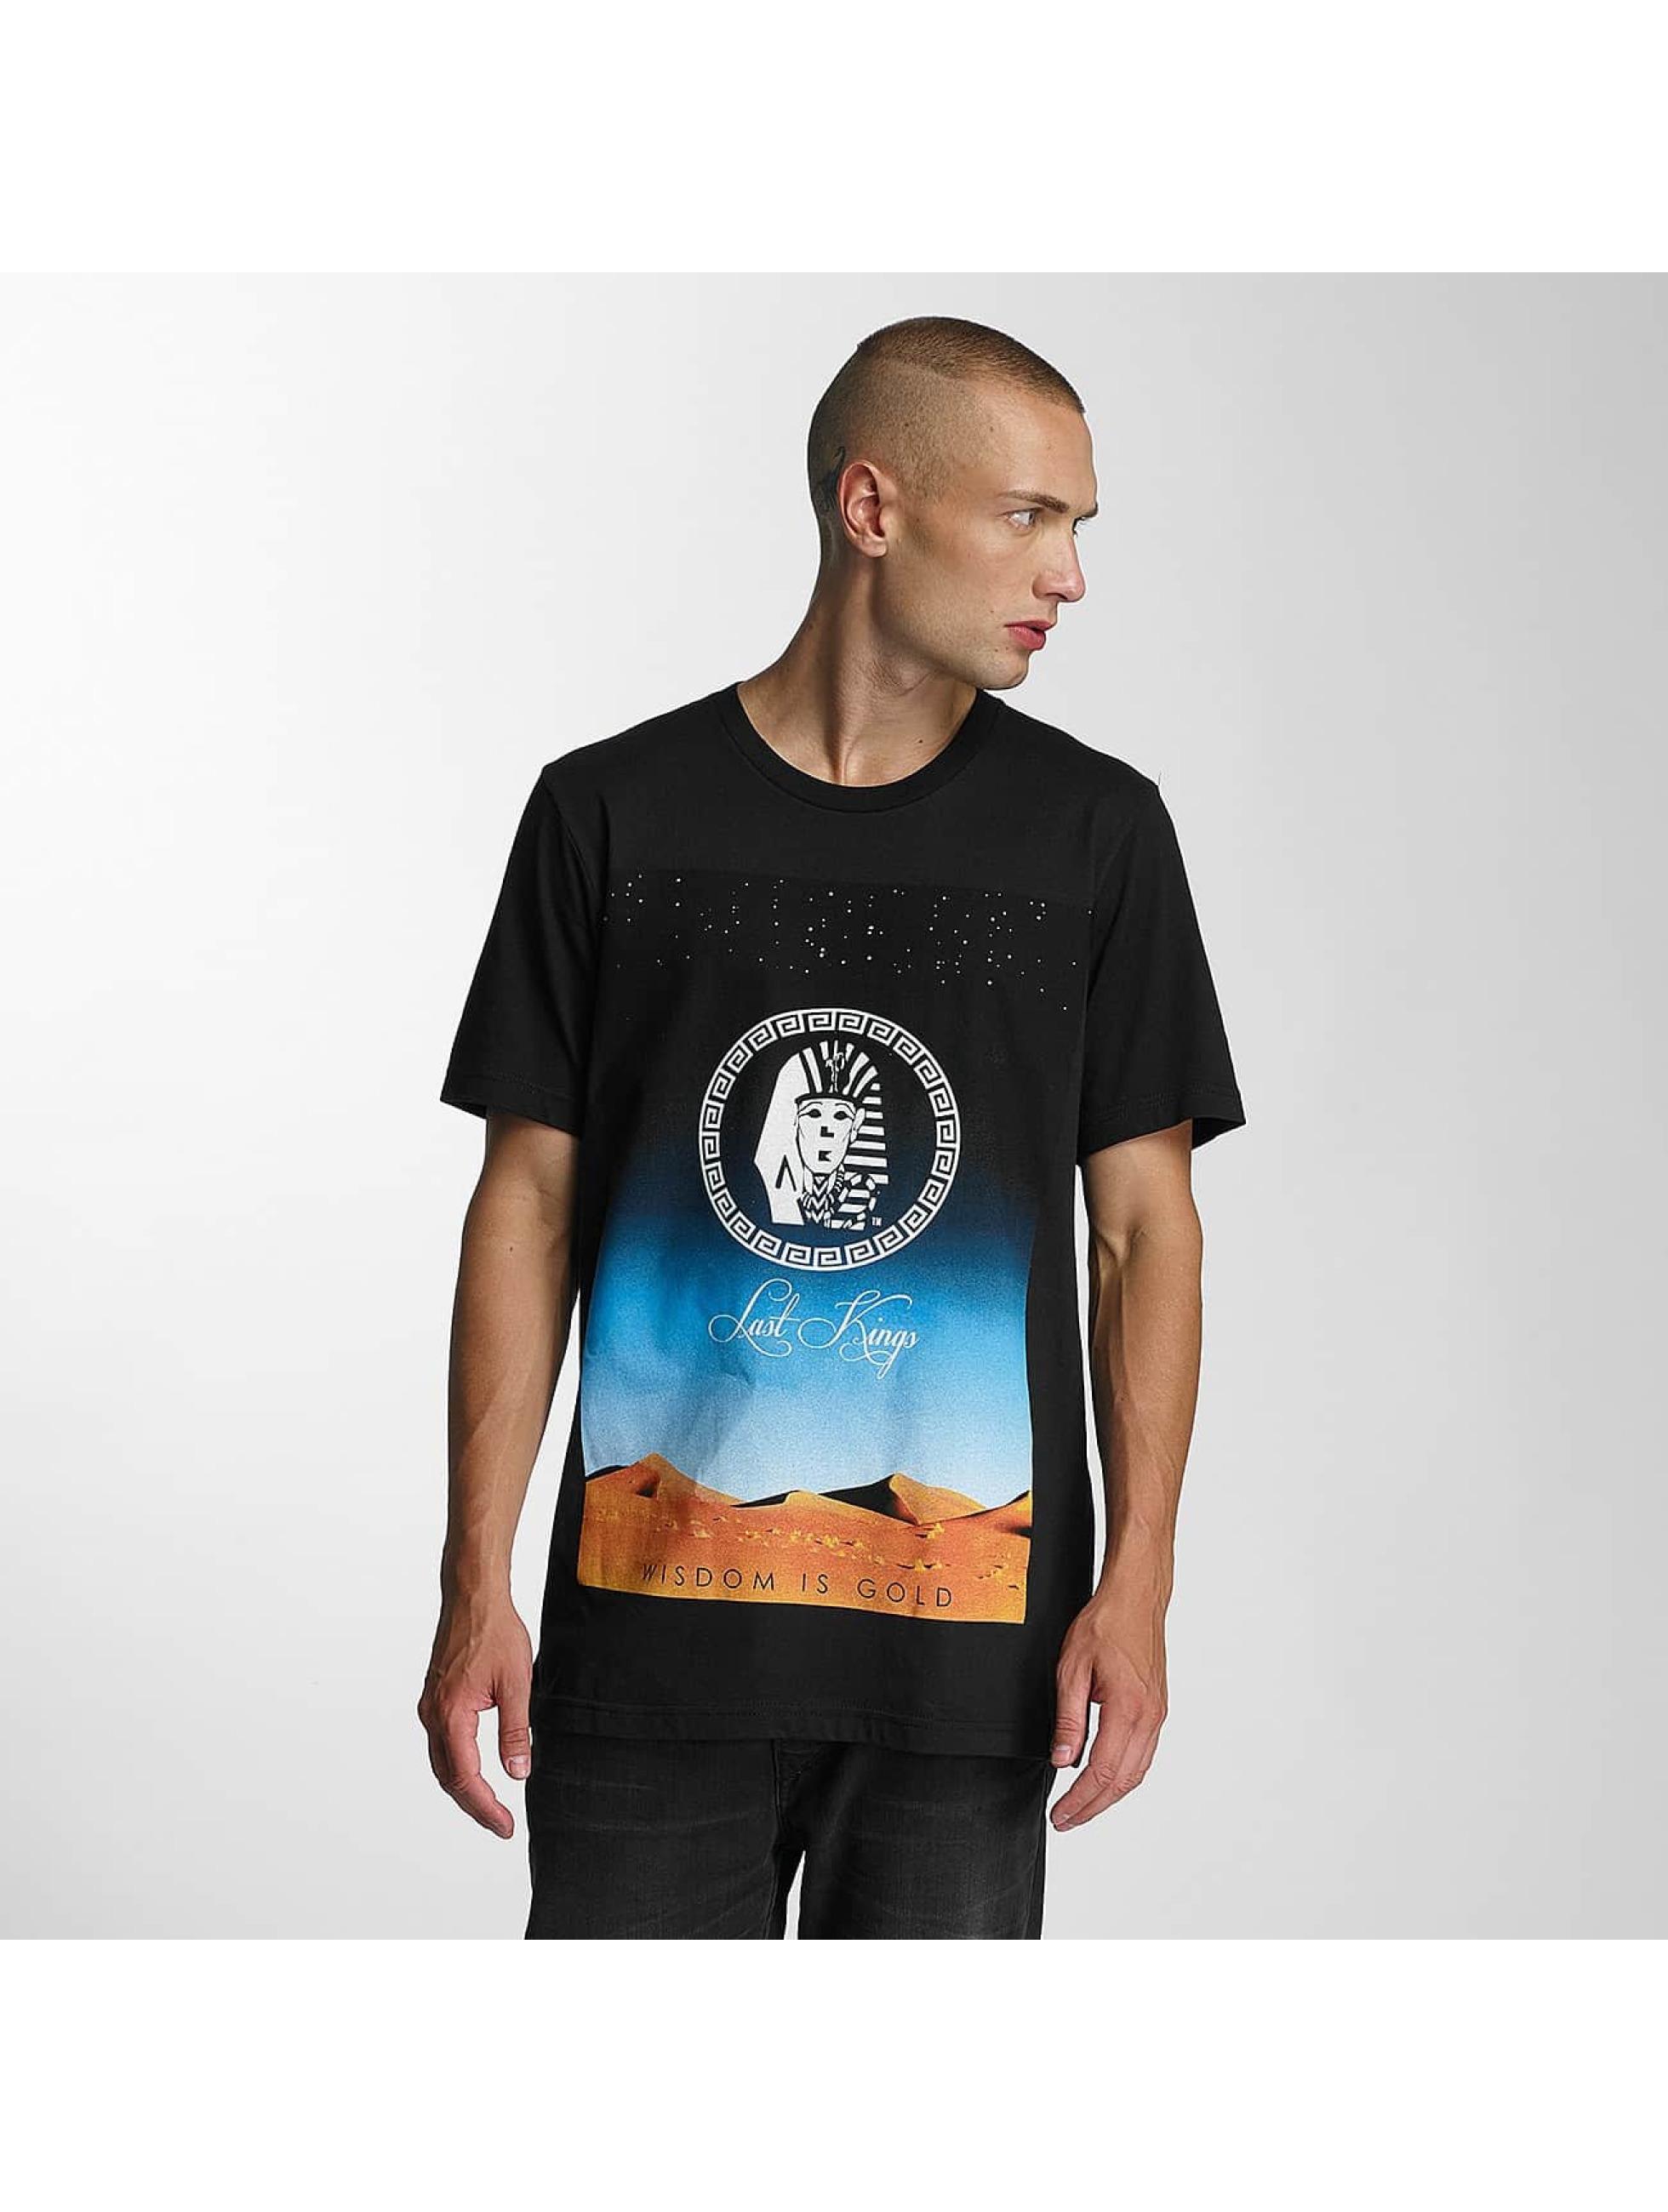 Last-Kings-Uomini-Maglieria-T-shirt-Dunes